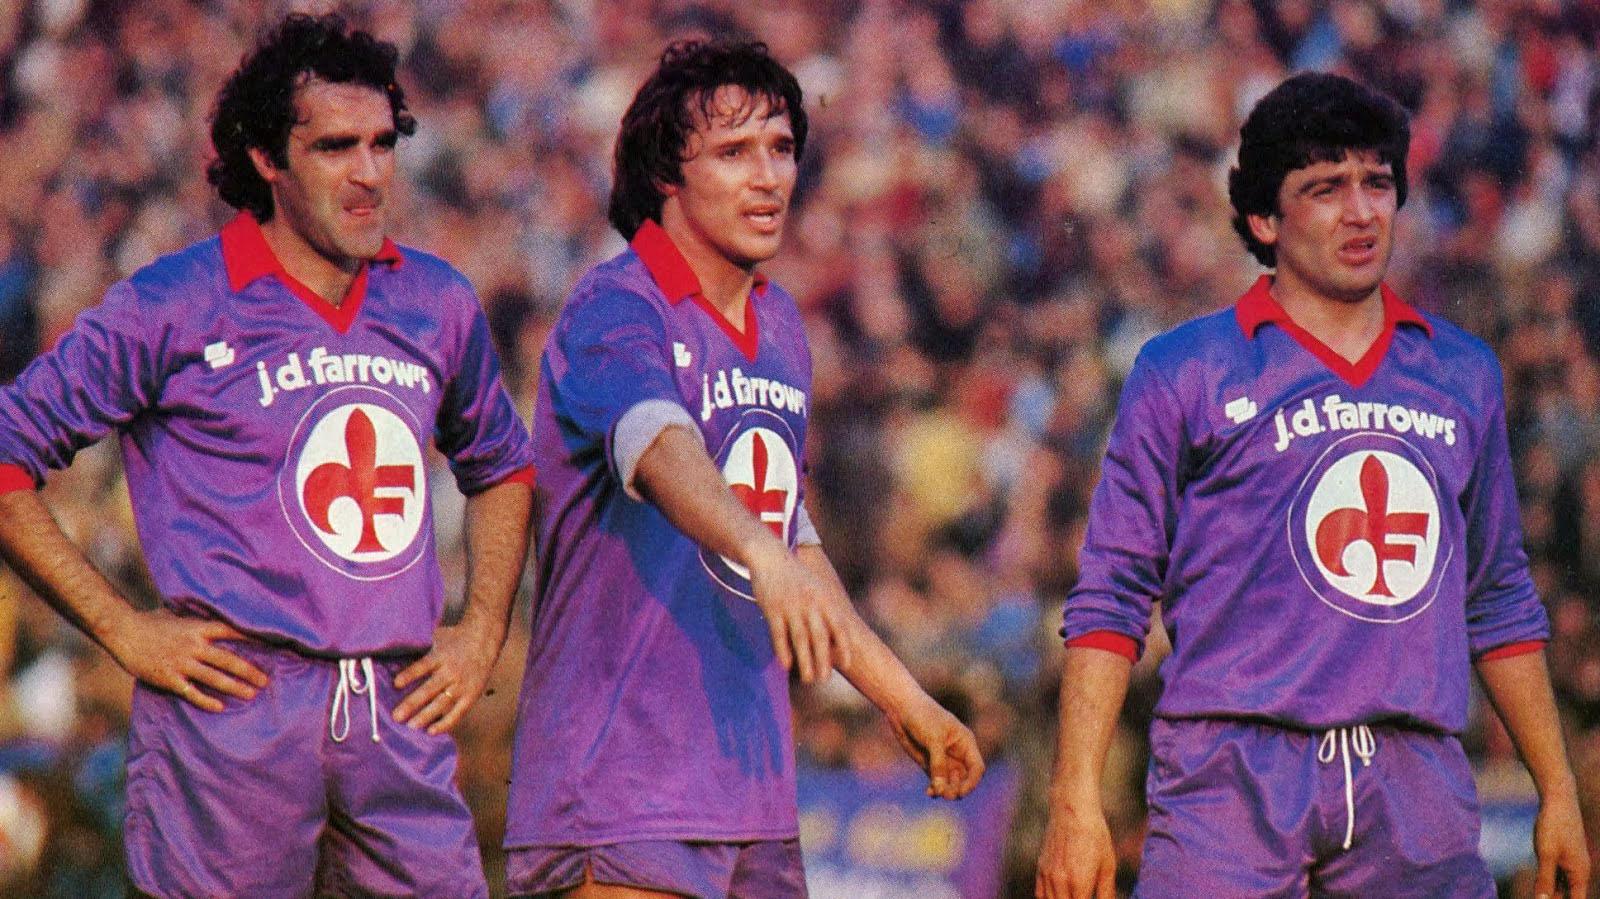 Fiorentina_1981-82_-_Antonello_Cuccureddu_Daniel_Bertoni_ed_Eraldo_Pecci.jpg